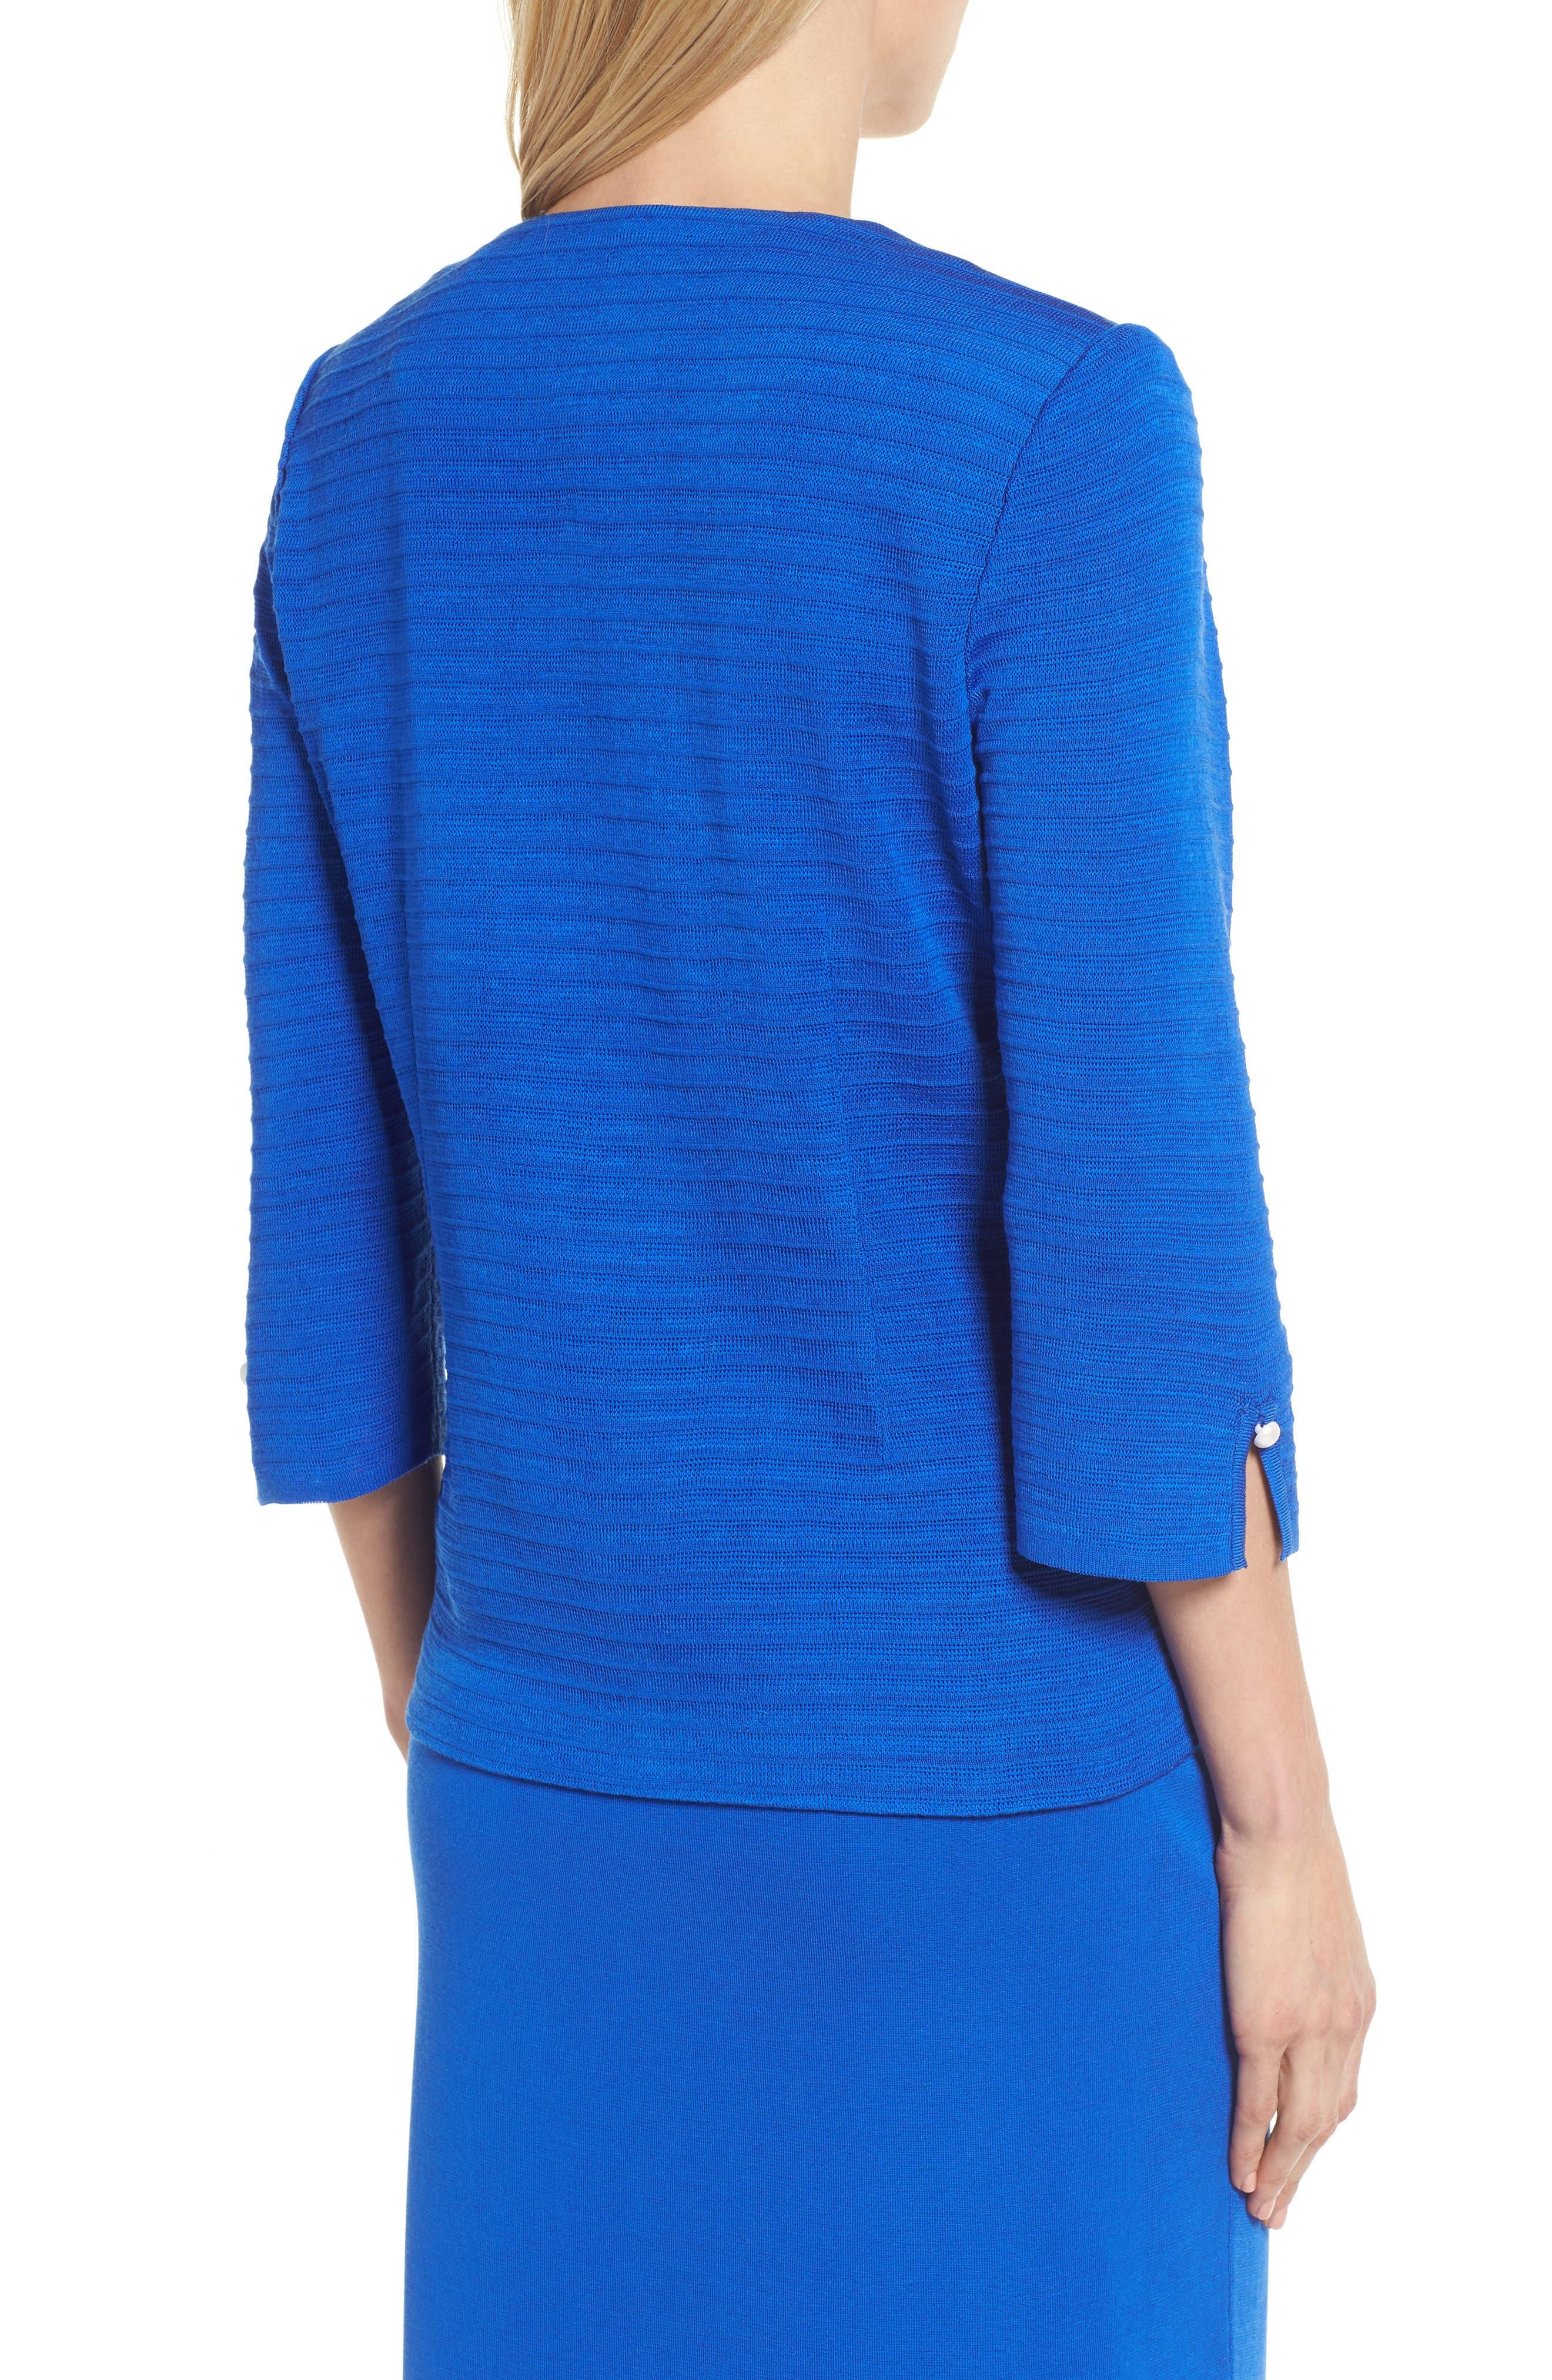 Textured Three Quarter Sleeve Jacket,                             Alternate thumbnail 2, color,                             PATRIOT BLUE